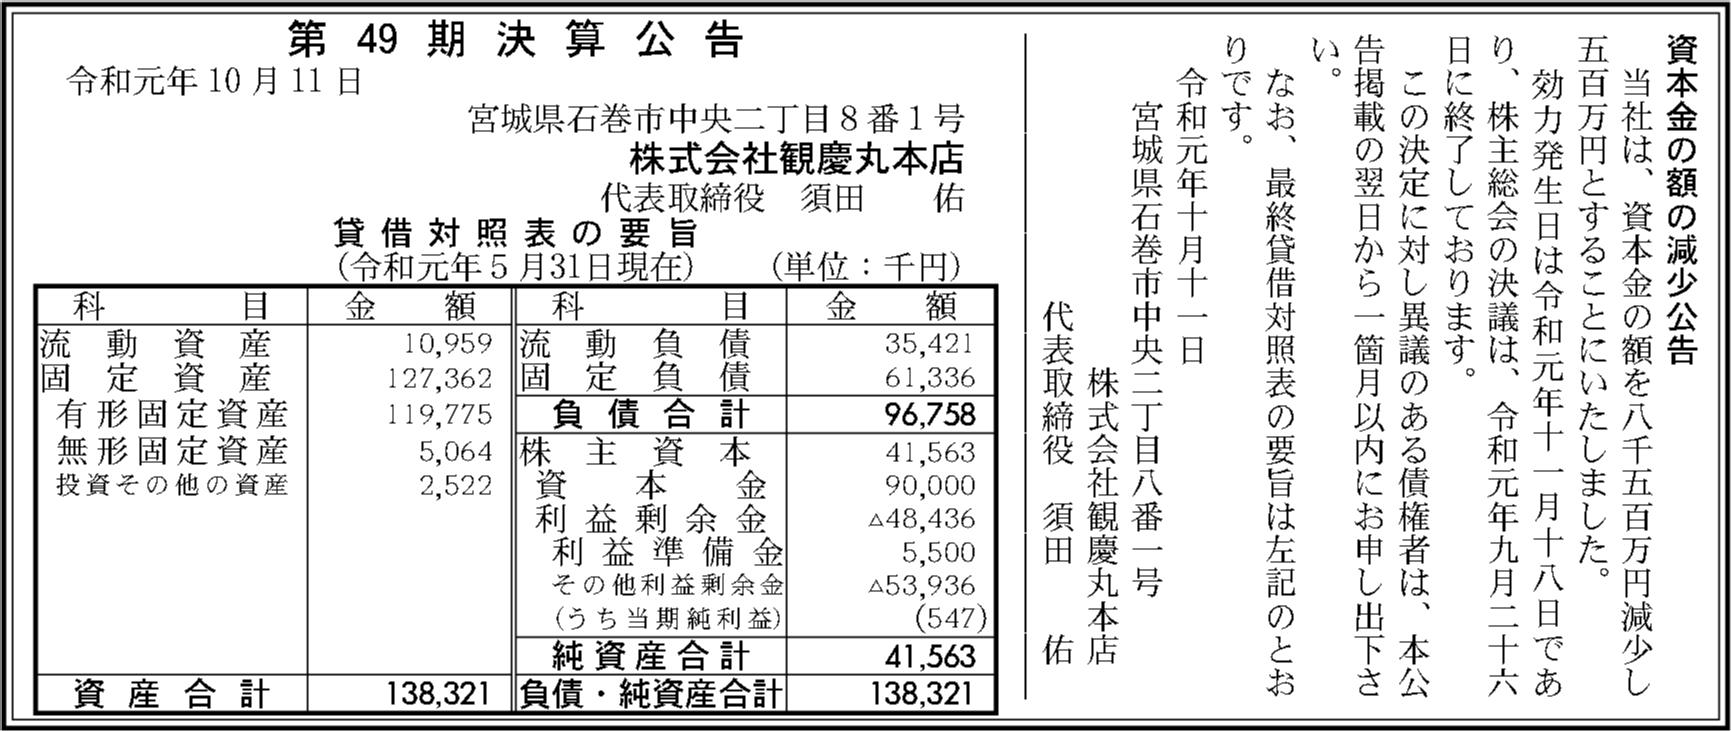 0058 0a1320889aff8b0266c3dcaf8bd6f37c69bfcef971b8dfeff3eba99a0fe273f5aaff27c3fa787a2f31a0b911d503601712eb5fa1e1041e3dadb6522ef4a05d2f 05